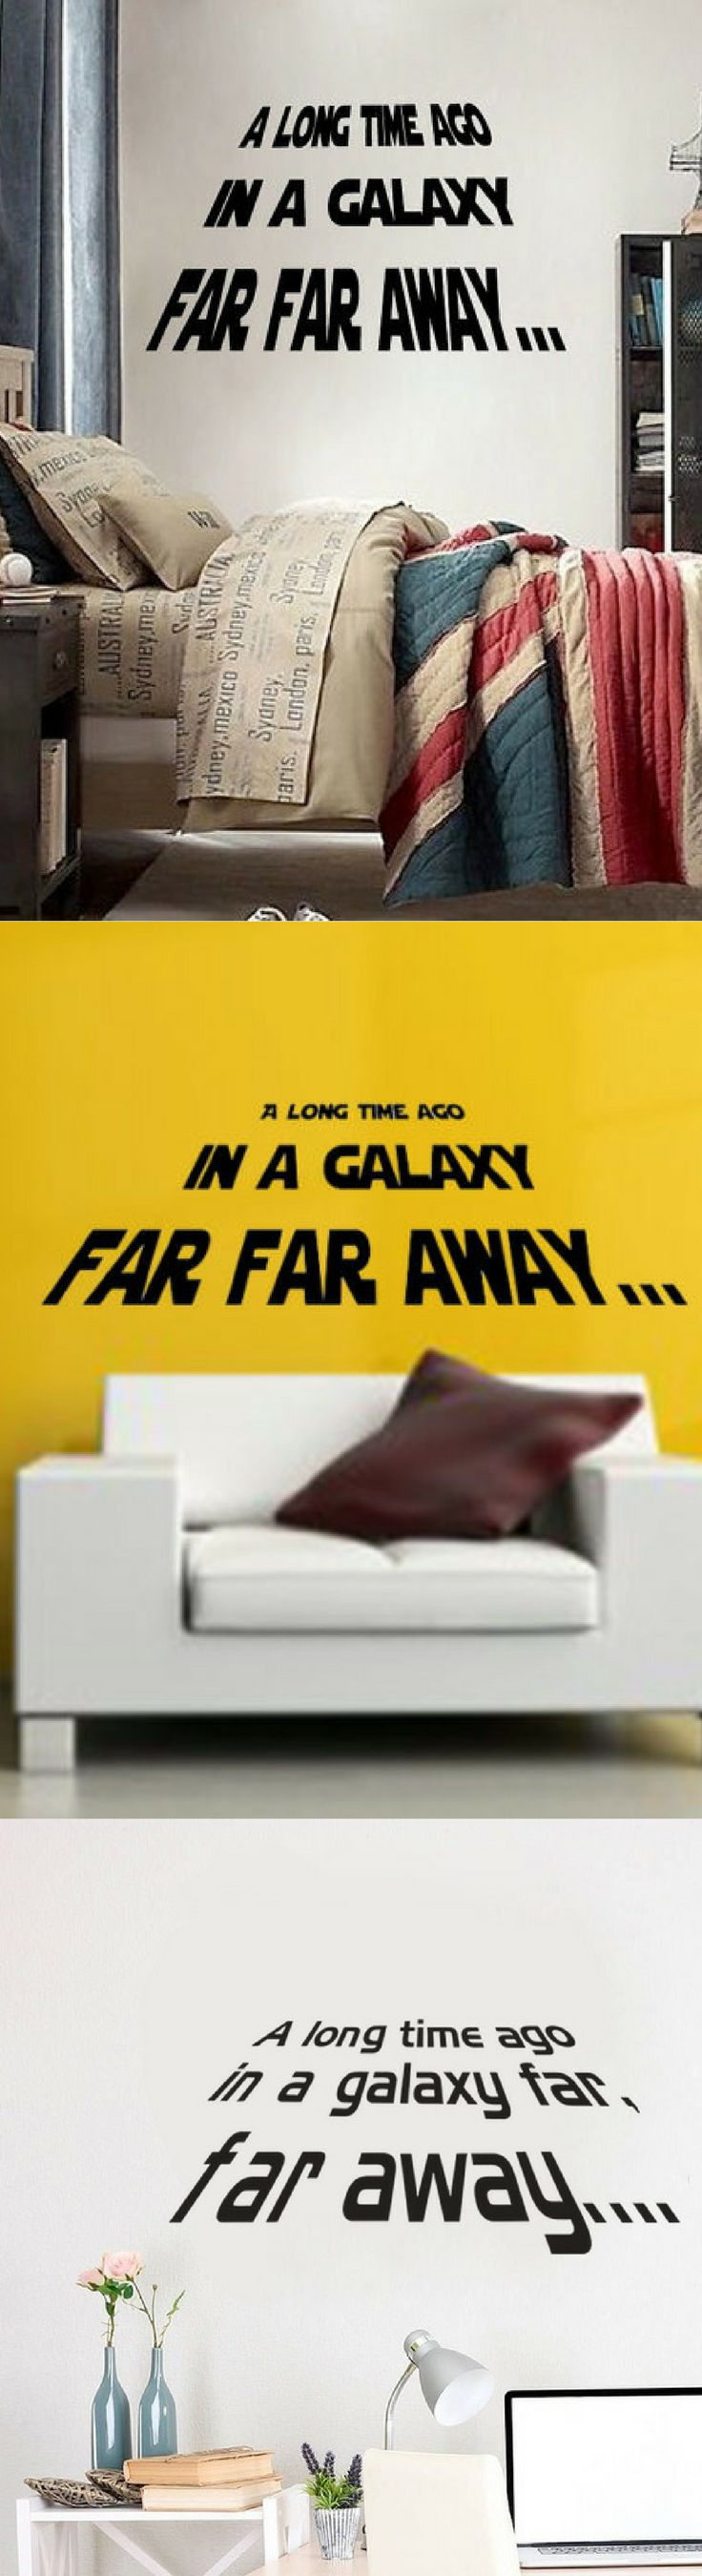 101 best Star Wars Decors images on Pinterest | Star wars, Toilet ...